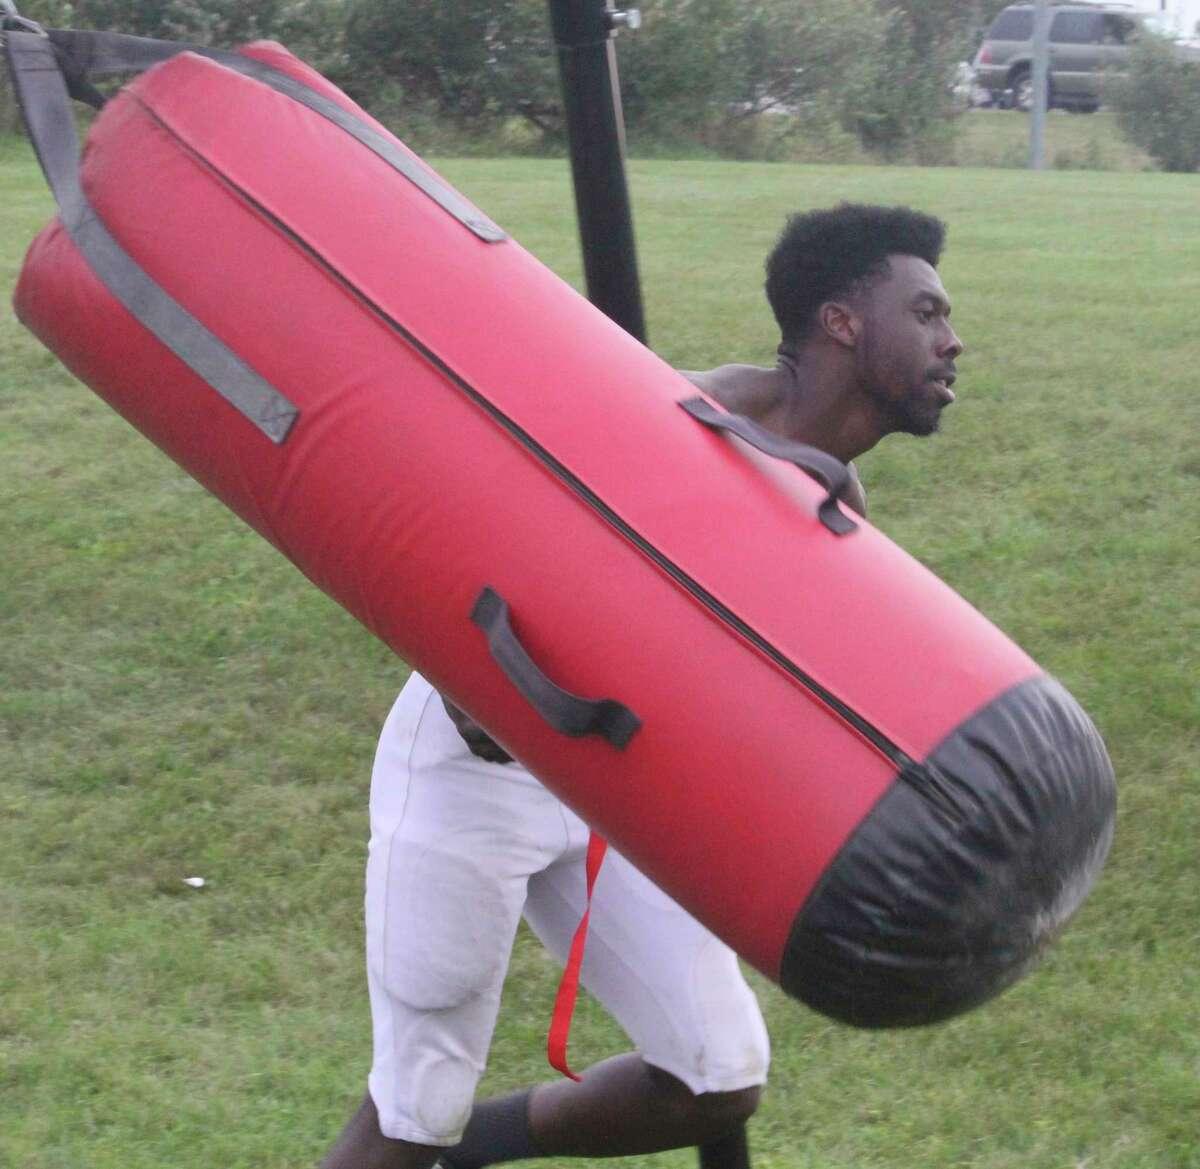 Big Rapids' Jamal Strickland works with the blocking bag after a recent Cardinal practice. (Pioneer photo/John Raffel)